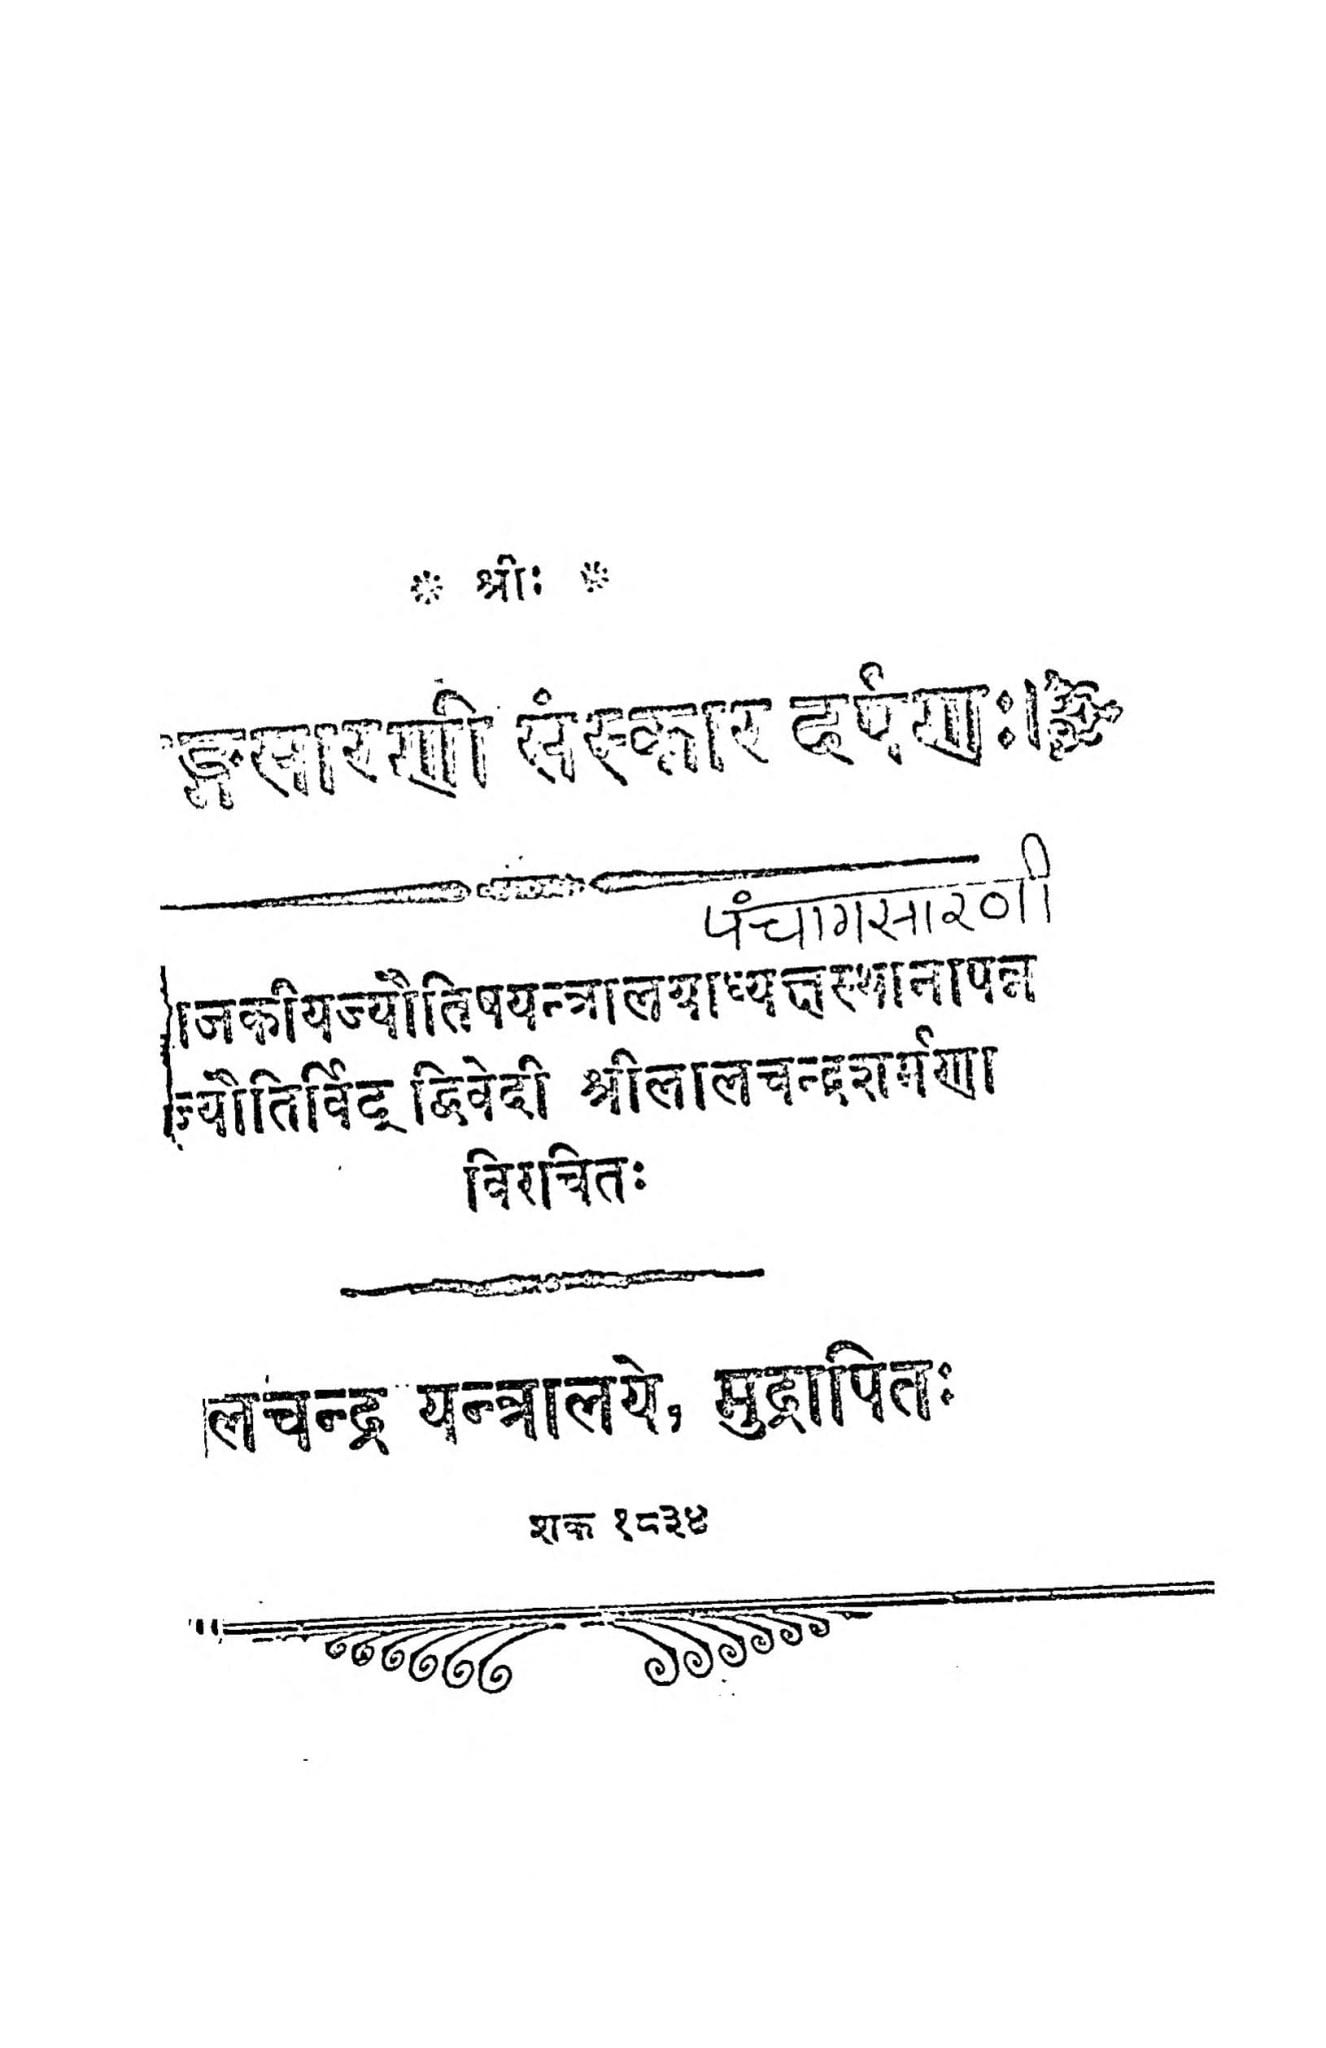 Panchang Sarani Sanskar Darpan by लालचन्द्र शर्मा - Lalchandra Sharma